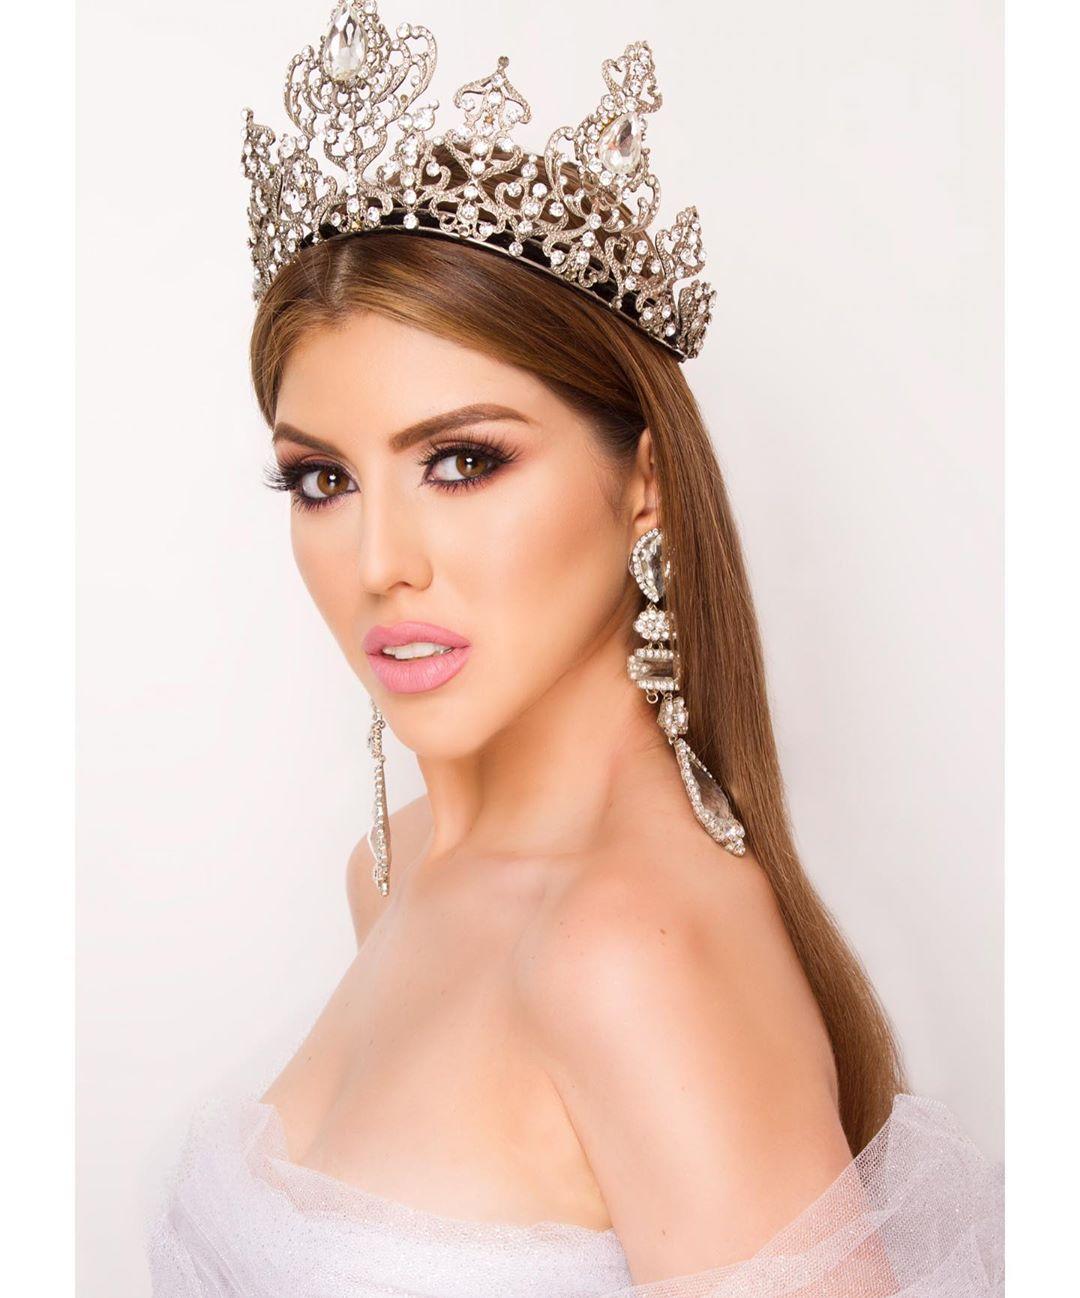 mariana galindez, 3ra finalista de miss latinoamerica 2019. 69805910